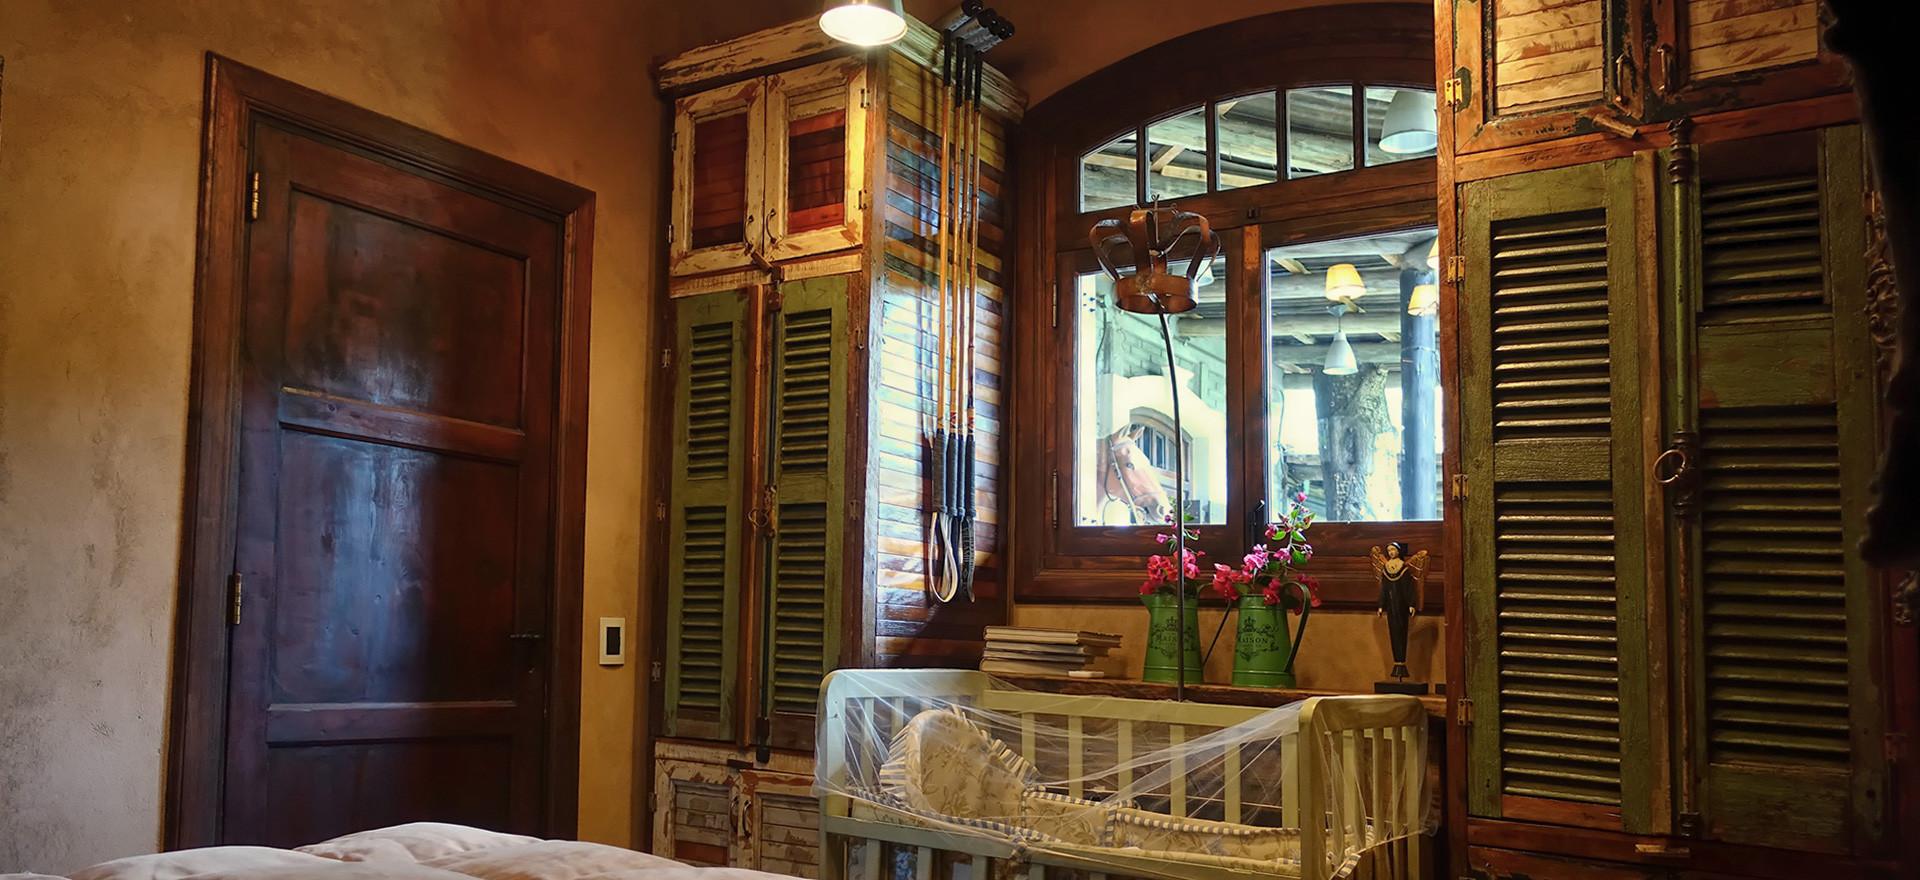 2 Guests Room +1 baby 26mts2 + breakfast u$s199 Por noche